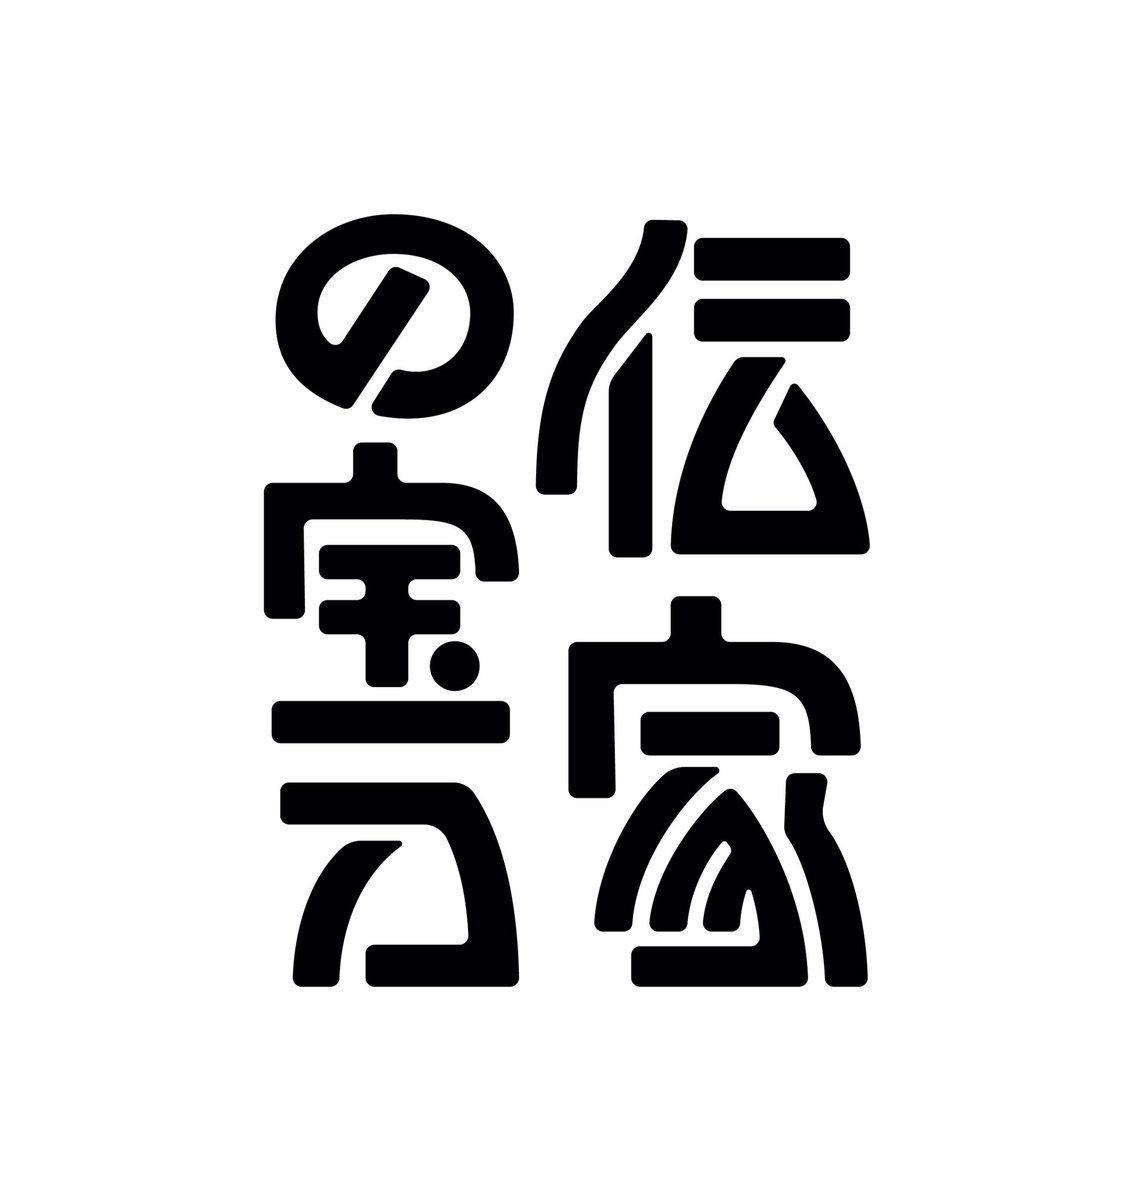 Favd Typosanpo September 04 2017 At 10 34pm タイポグラフィー 漢字ロゴ 日本語ロゴ